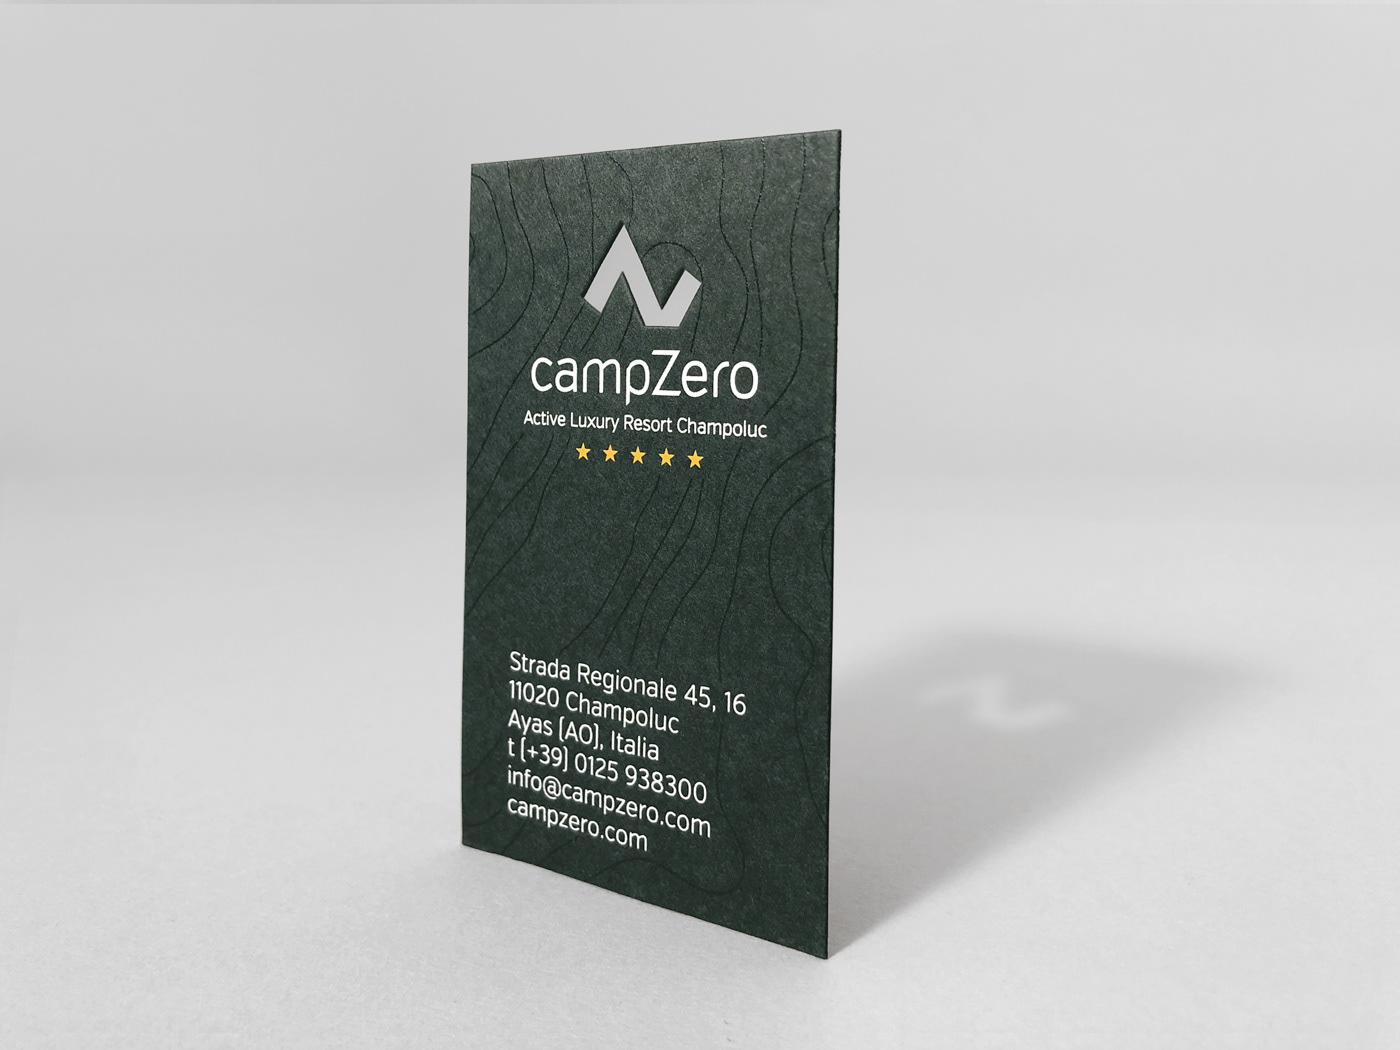 brand,brand identity,logo,Logo Design,print,business card,Signage,Arti Direction,hotel,resort